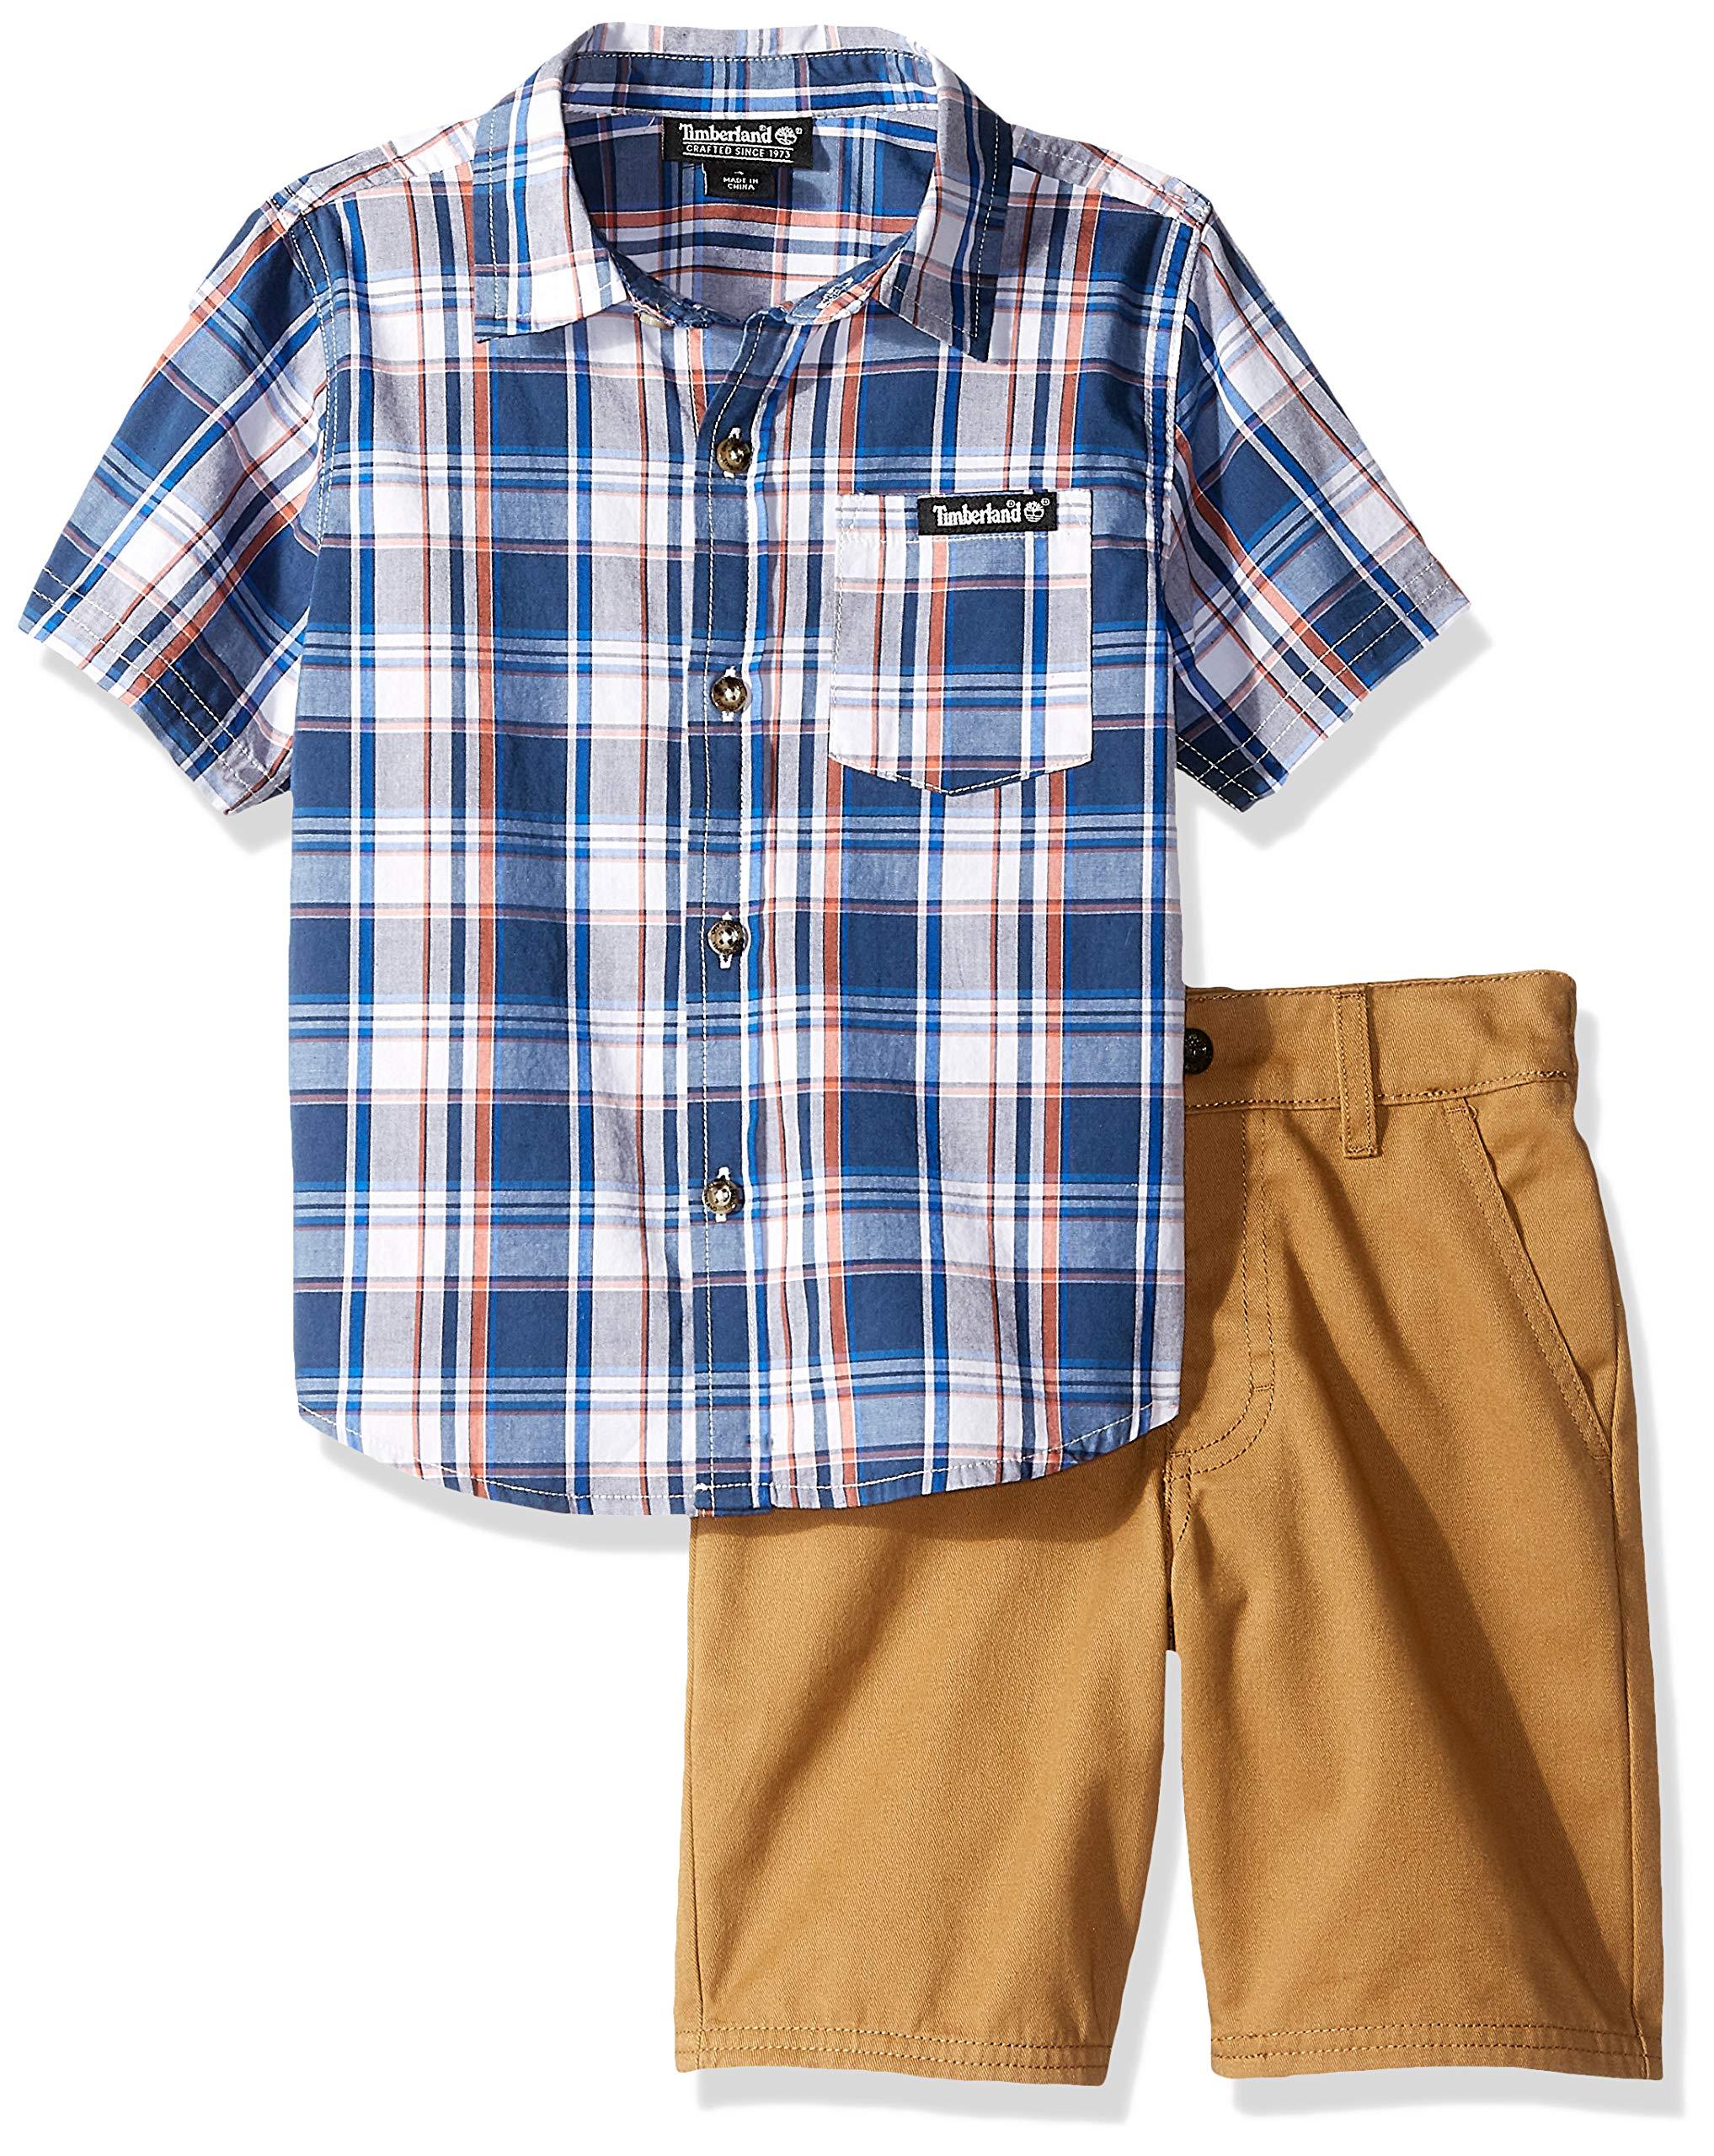 Timberland Boys' Little 2 Pieces Shirt Shorts Set, Blue Plaid/Khaki 4